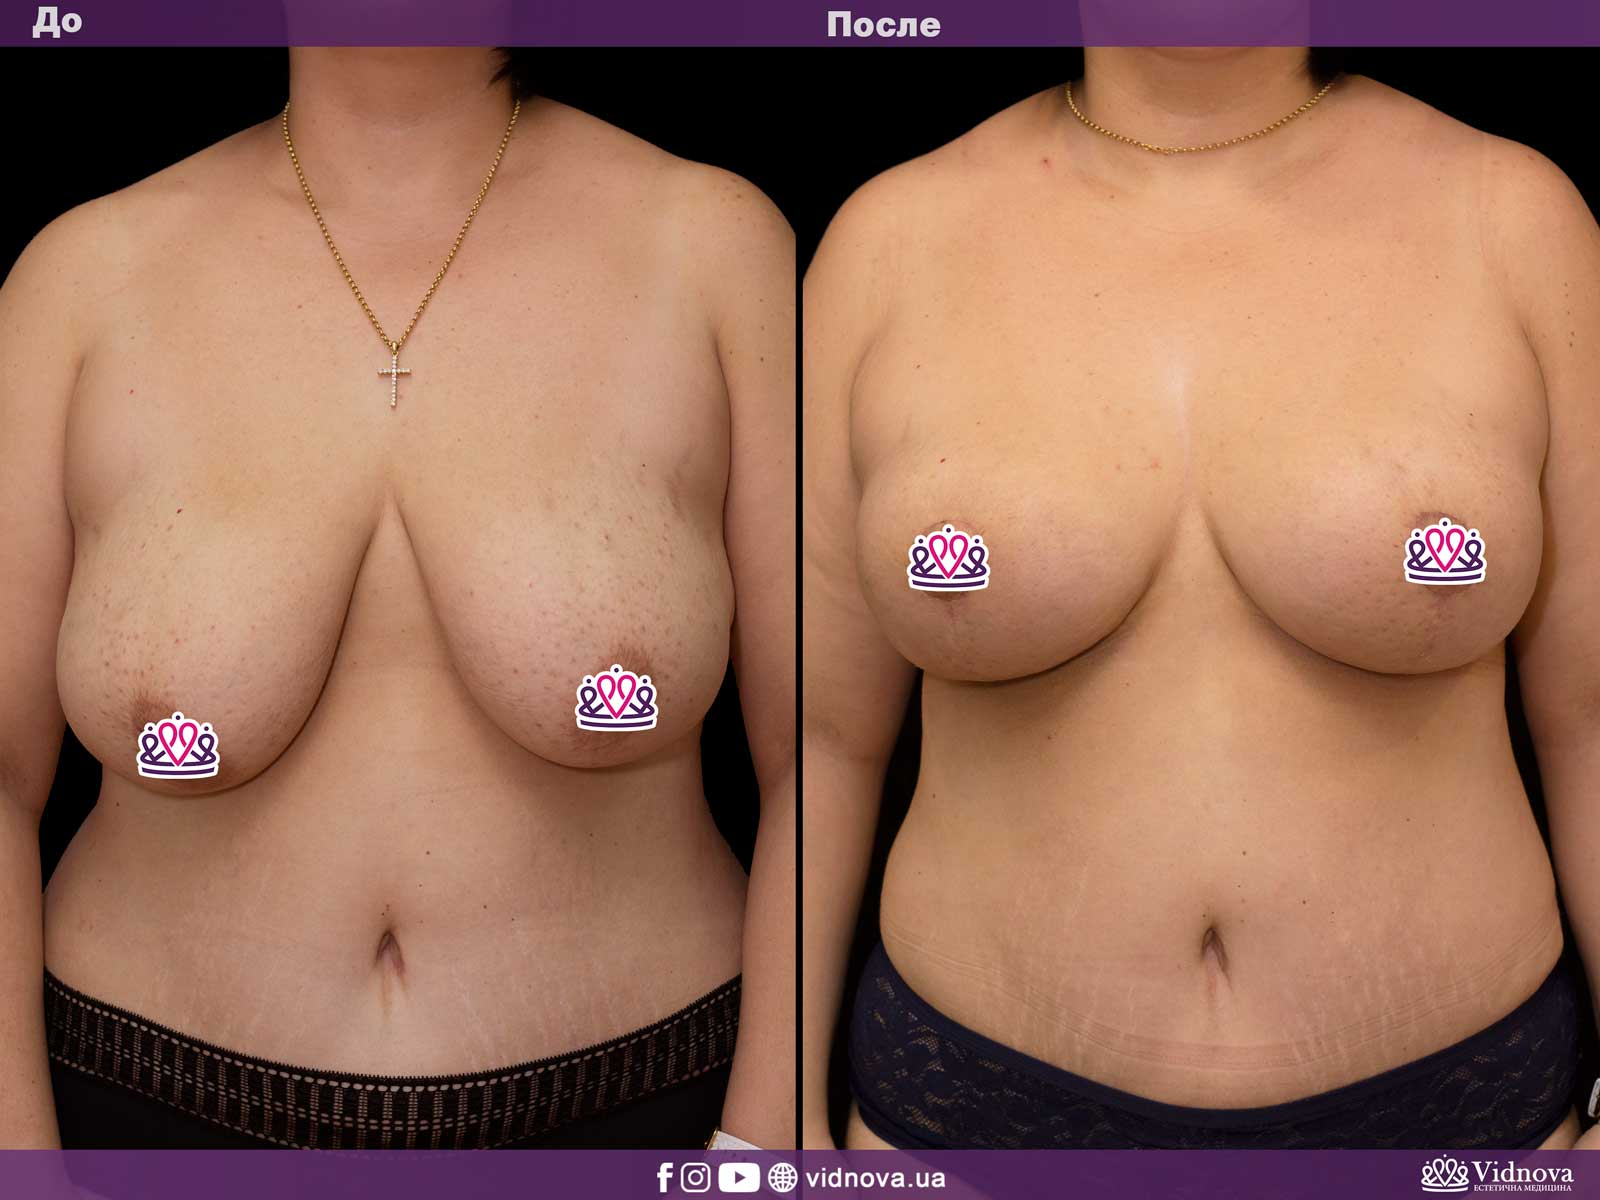 Подтяжка груди: Фото ДО и ПОСЛЕ - Пример №18-1 - Клиника Vidnova